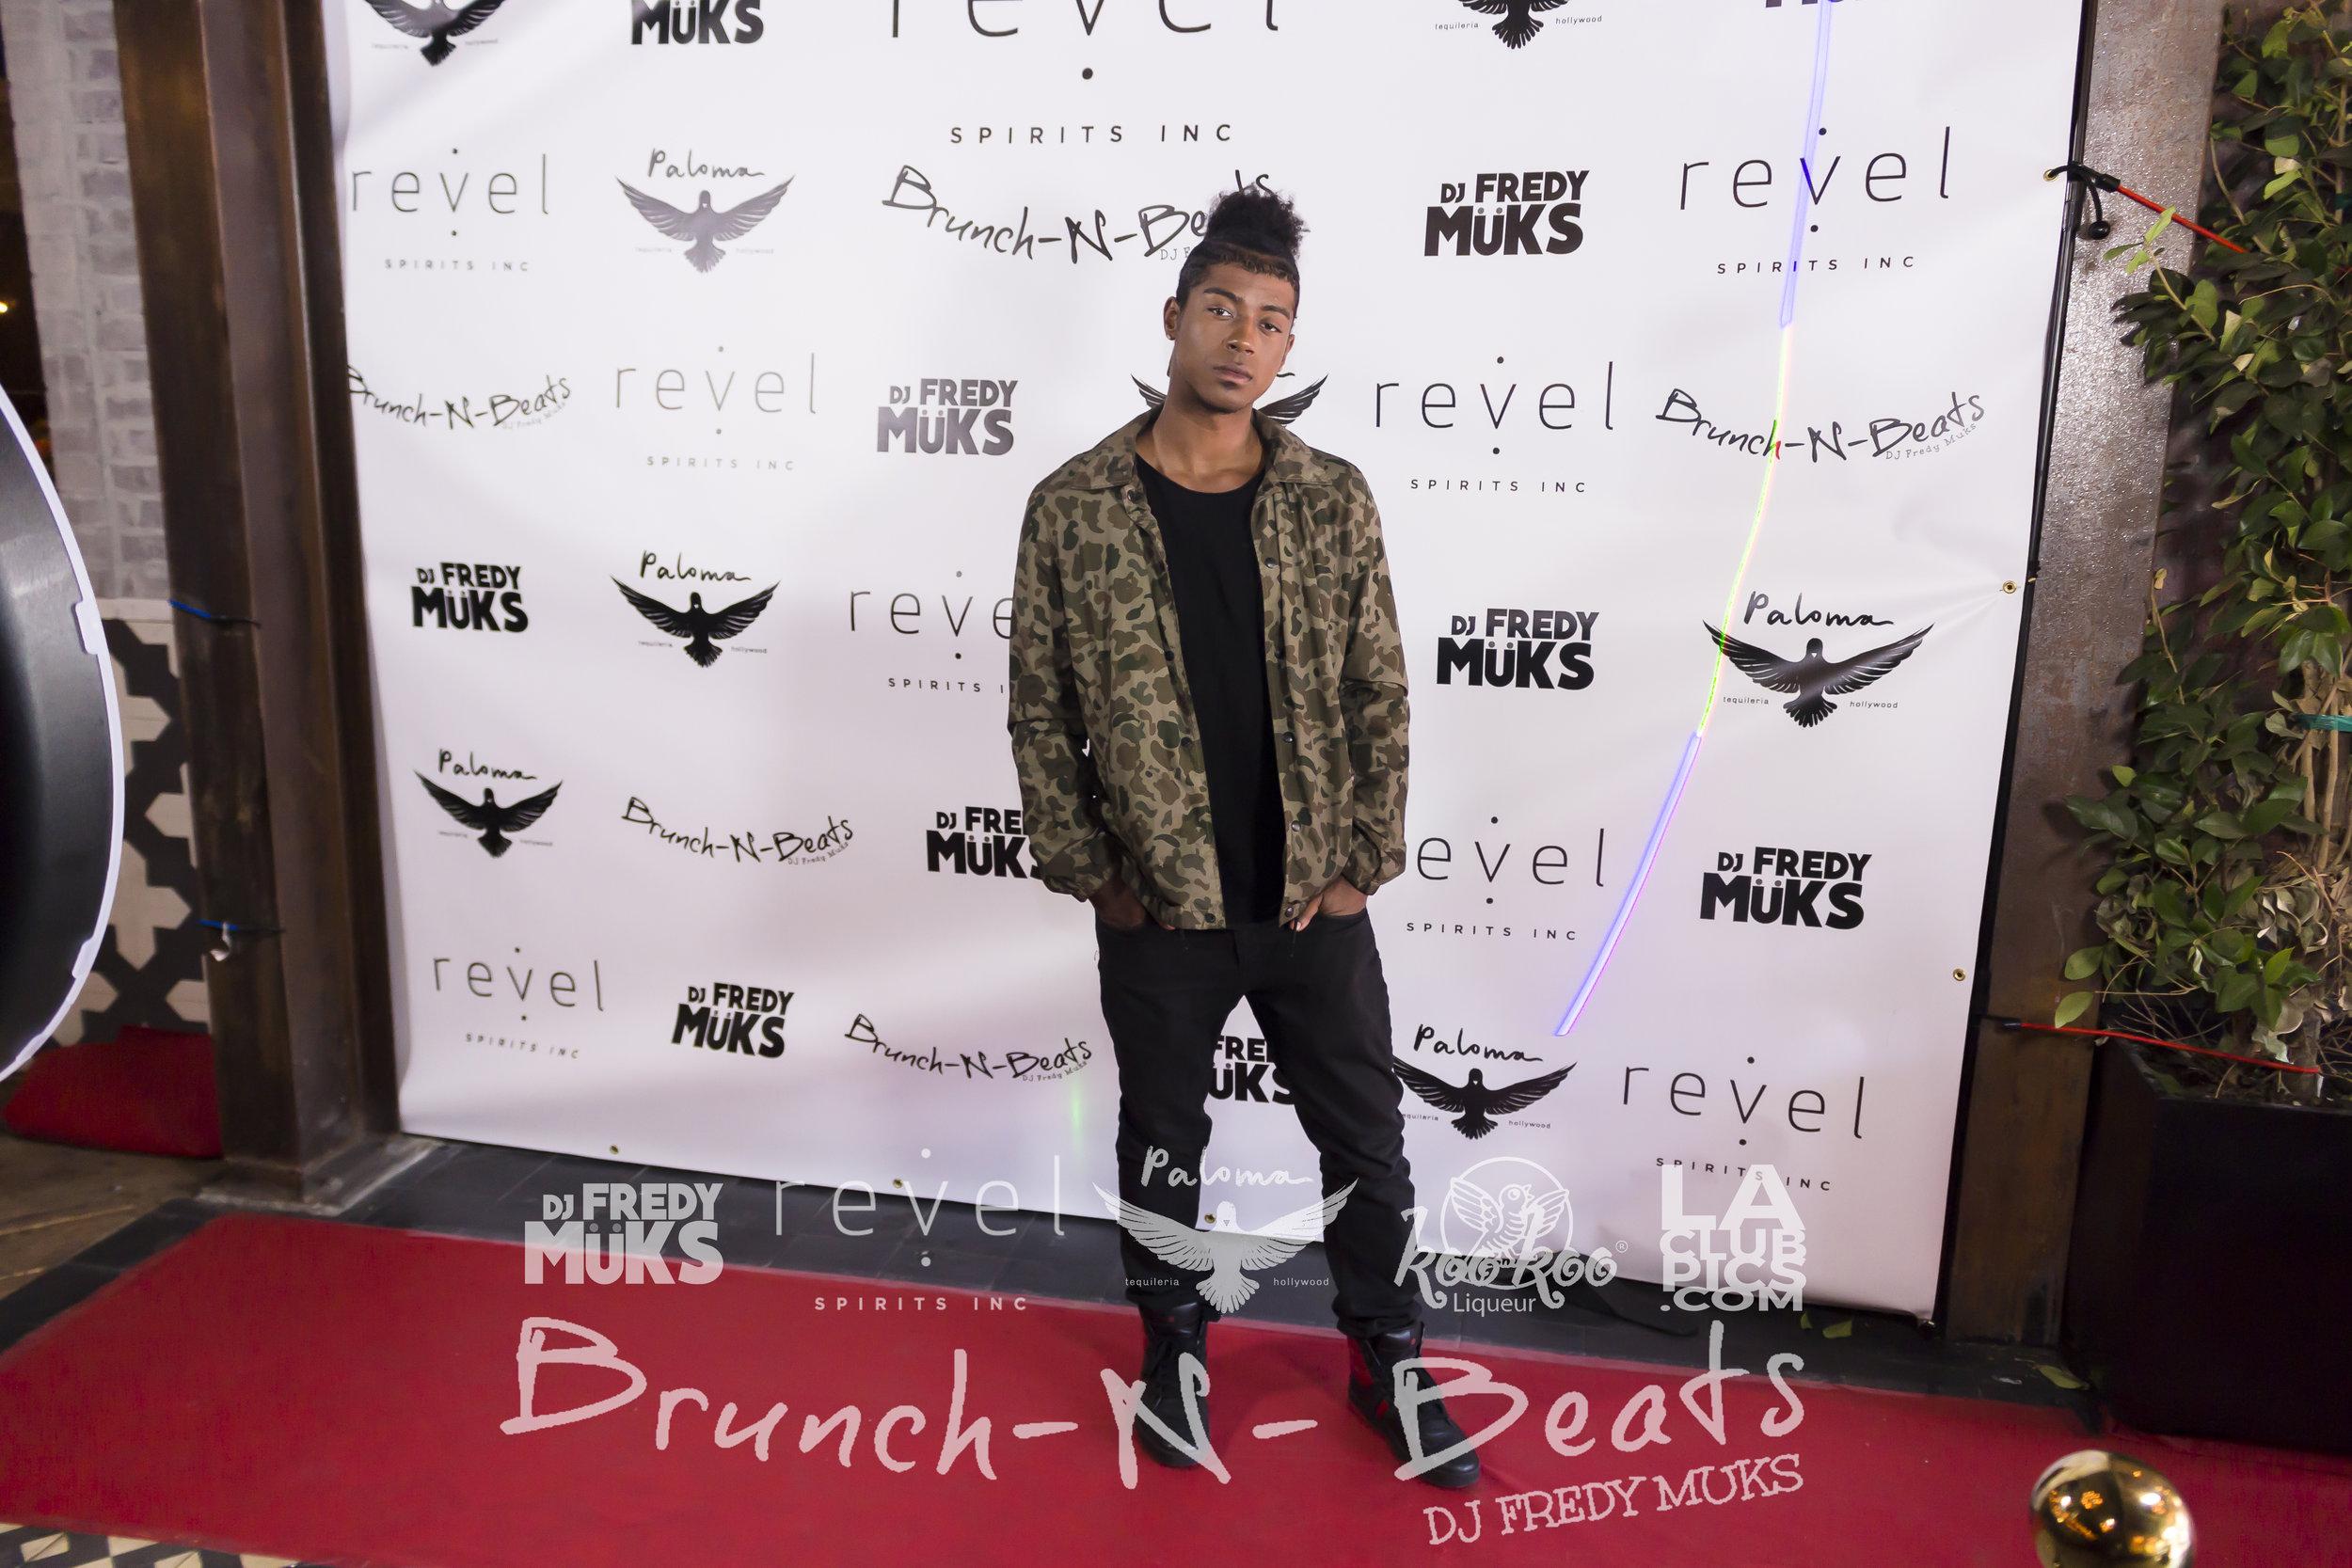 Brunch-N-Beats - Paloma Hollywood - 02-25-18_1.jpg